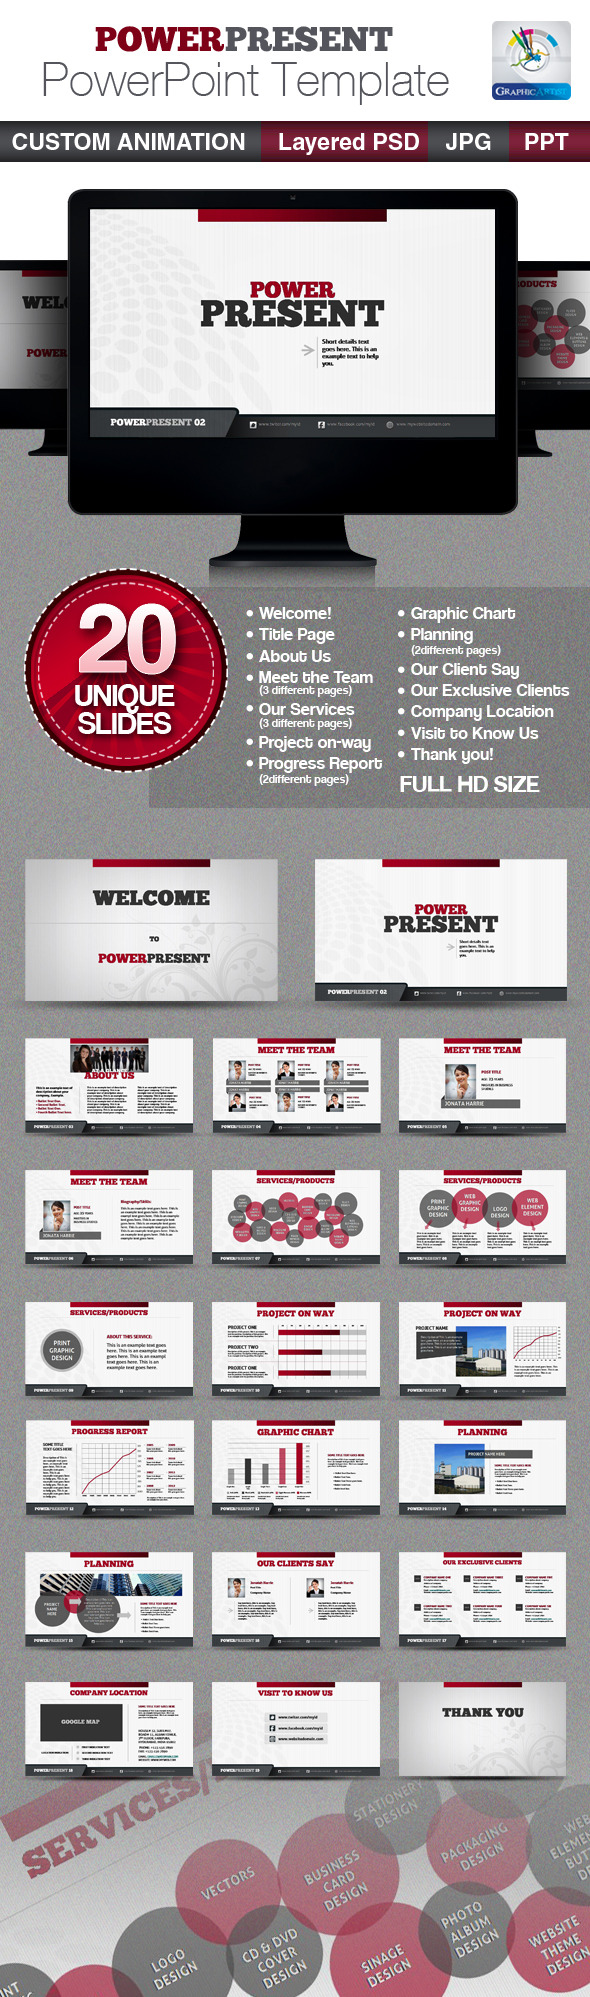 PowerPresent PowerPoint Templates - PowerPoint Templates Presentation Templates